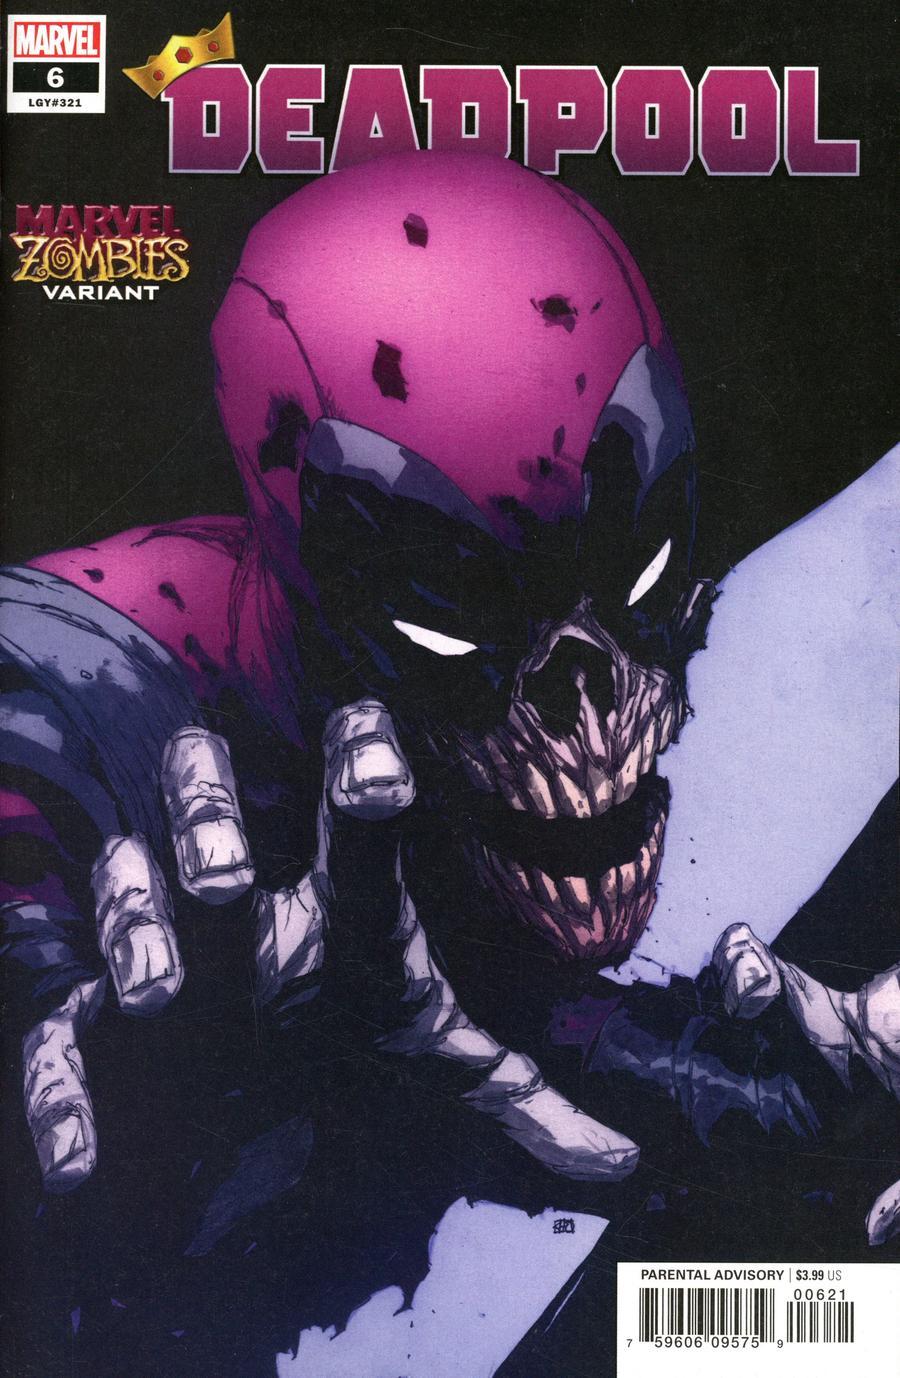 Deadpool Vol 7 #6 Cover B Variant Khoi Pham Marvel Zombies Cover